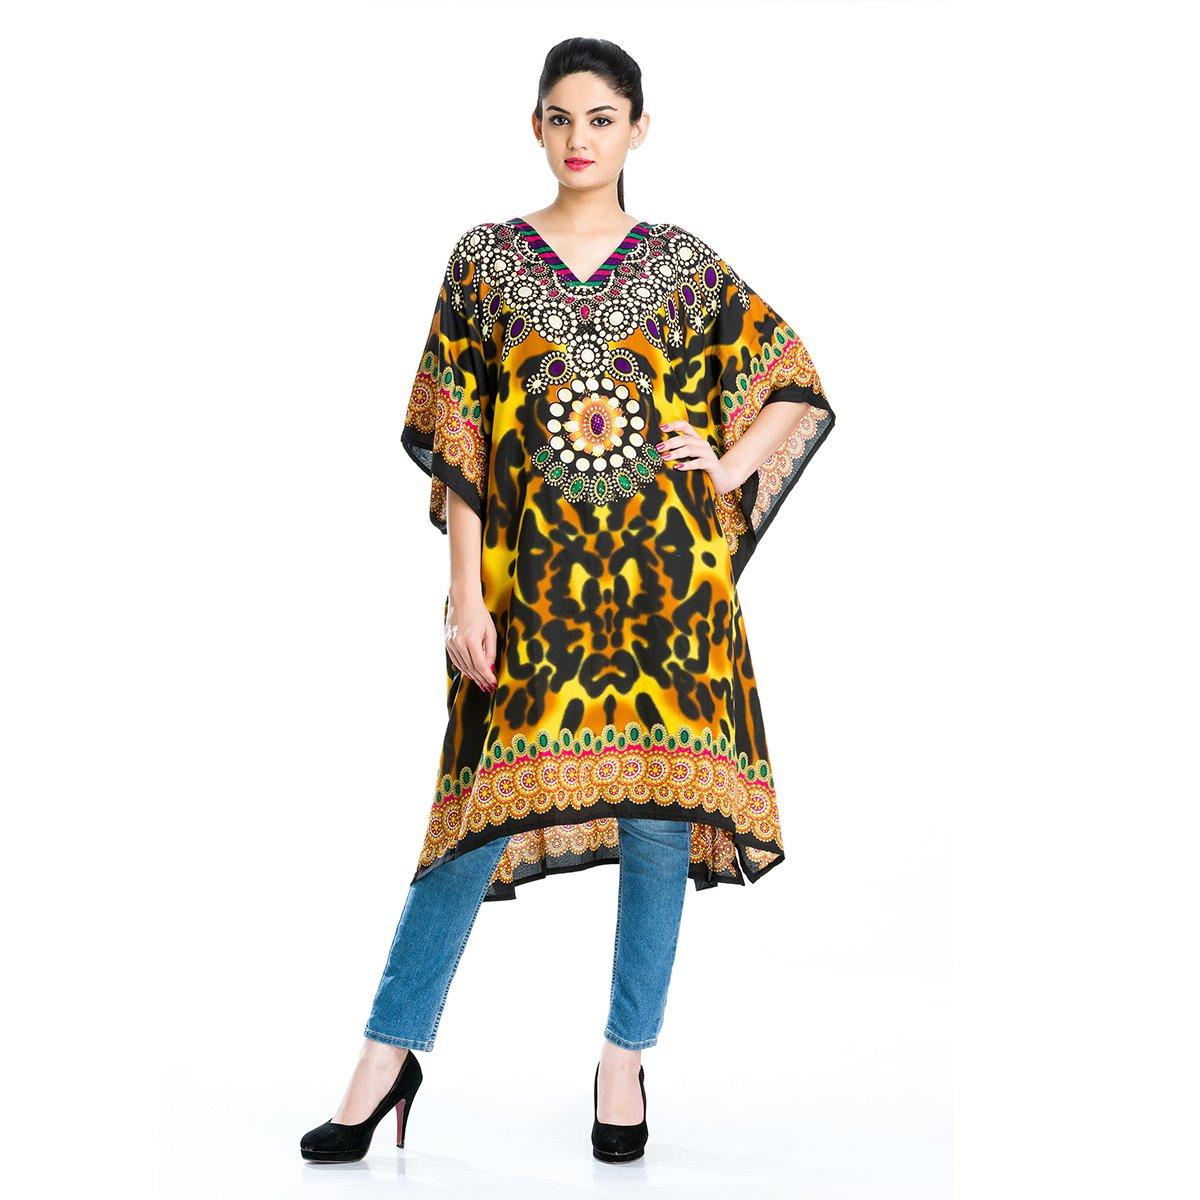 Goood Times Plus Size Boho-Chic Caftan Loose Beach Cover-up Dress Kaftan Maxi